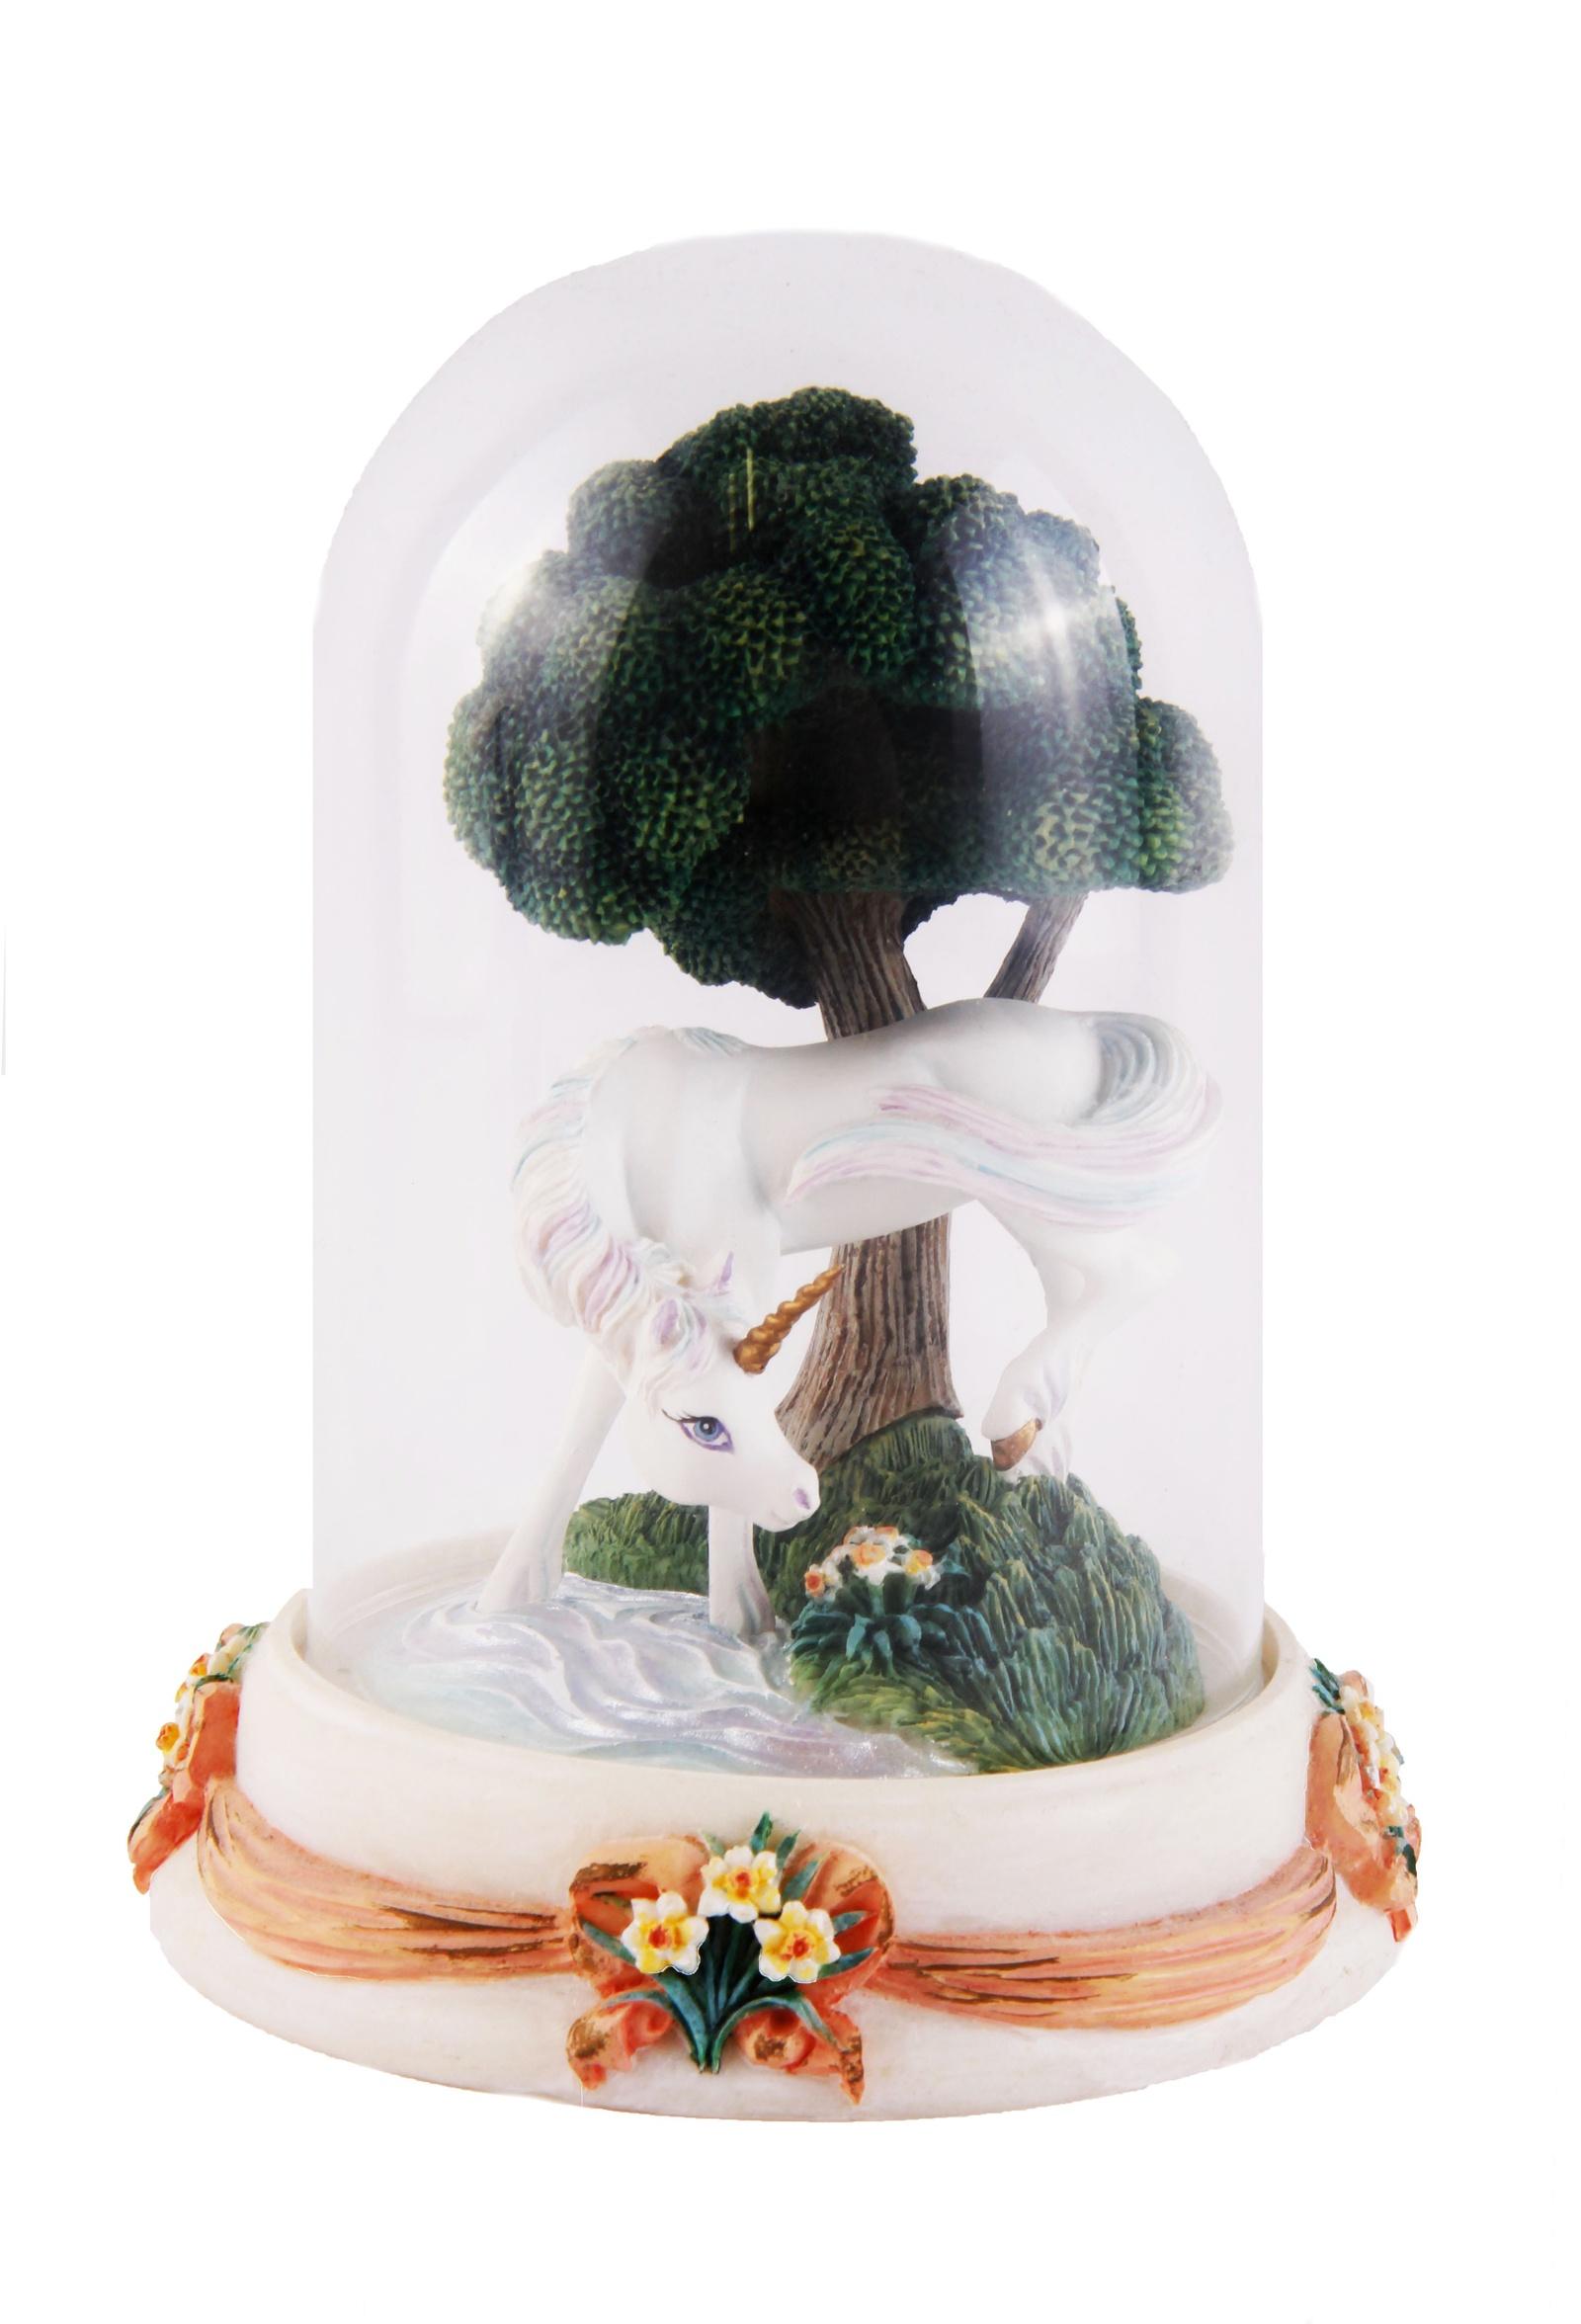 Статуэтка Franklin Mint Единорог, ОС334134, Керамика, Стекло